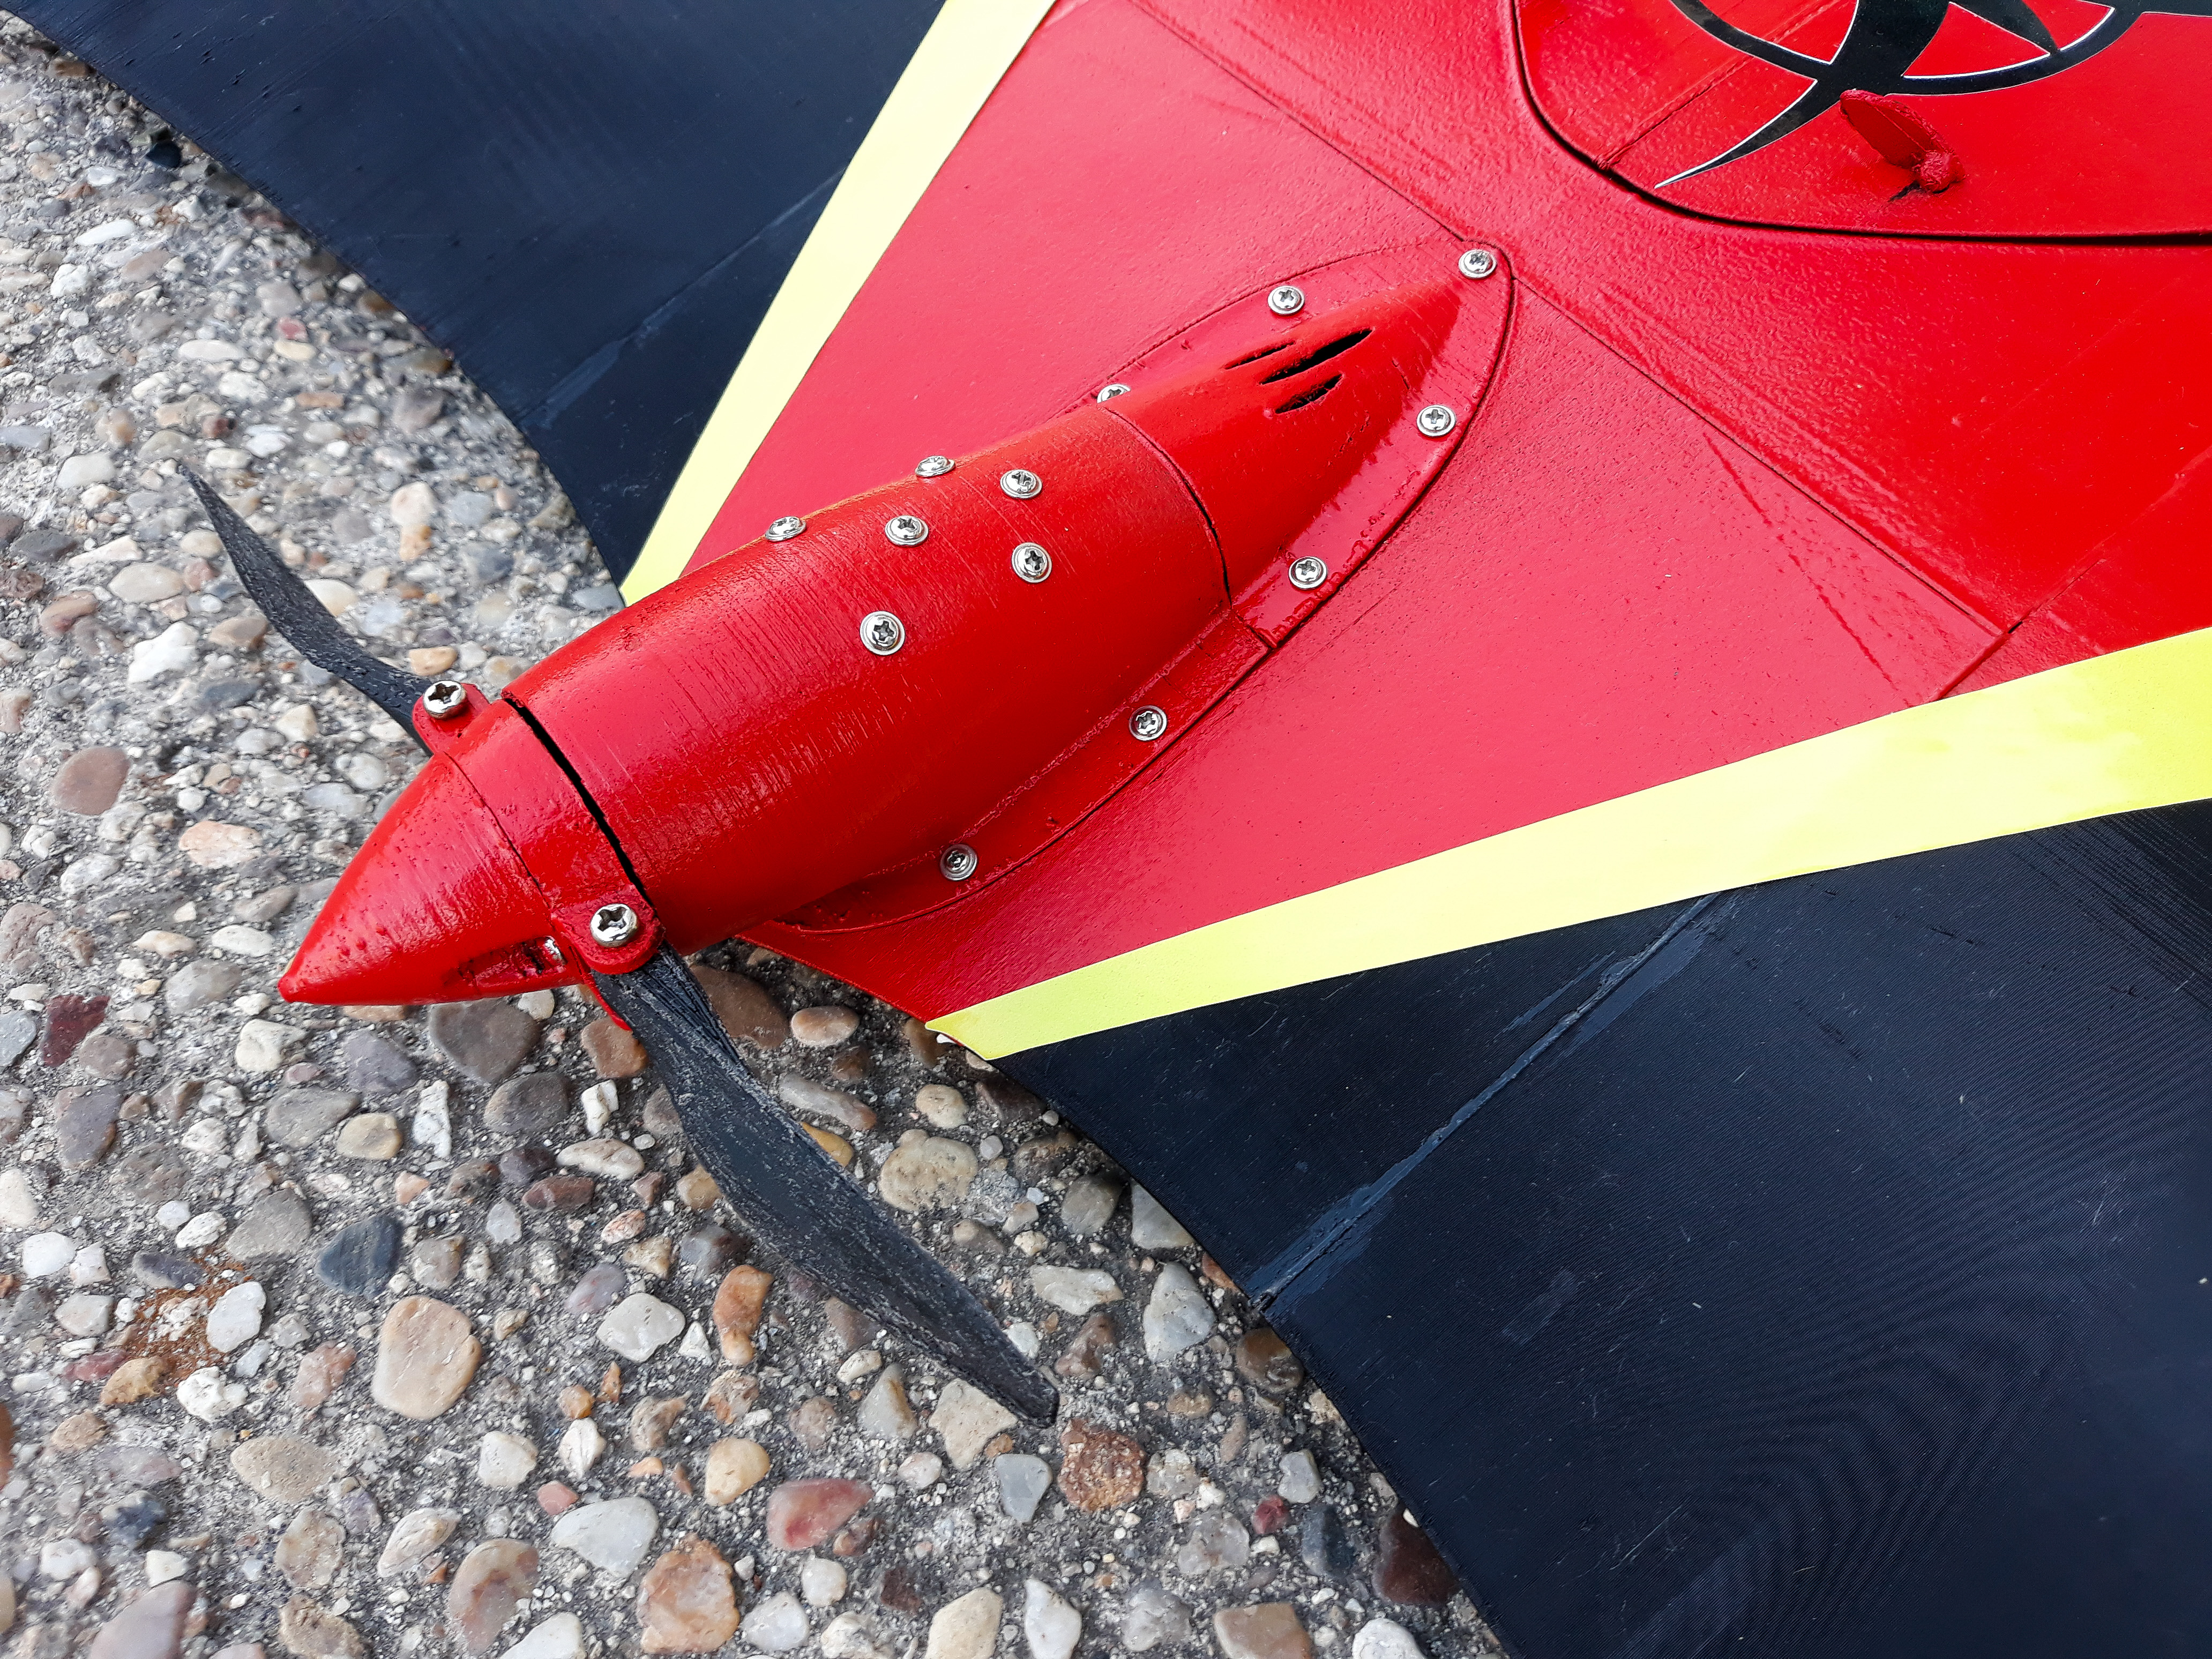 Folding propeller